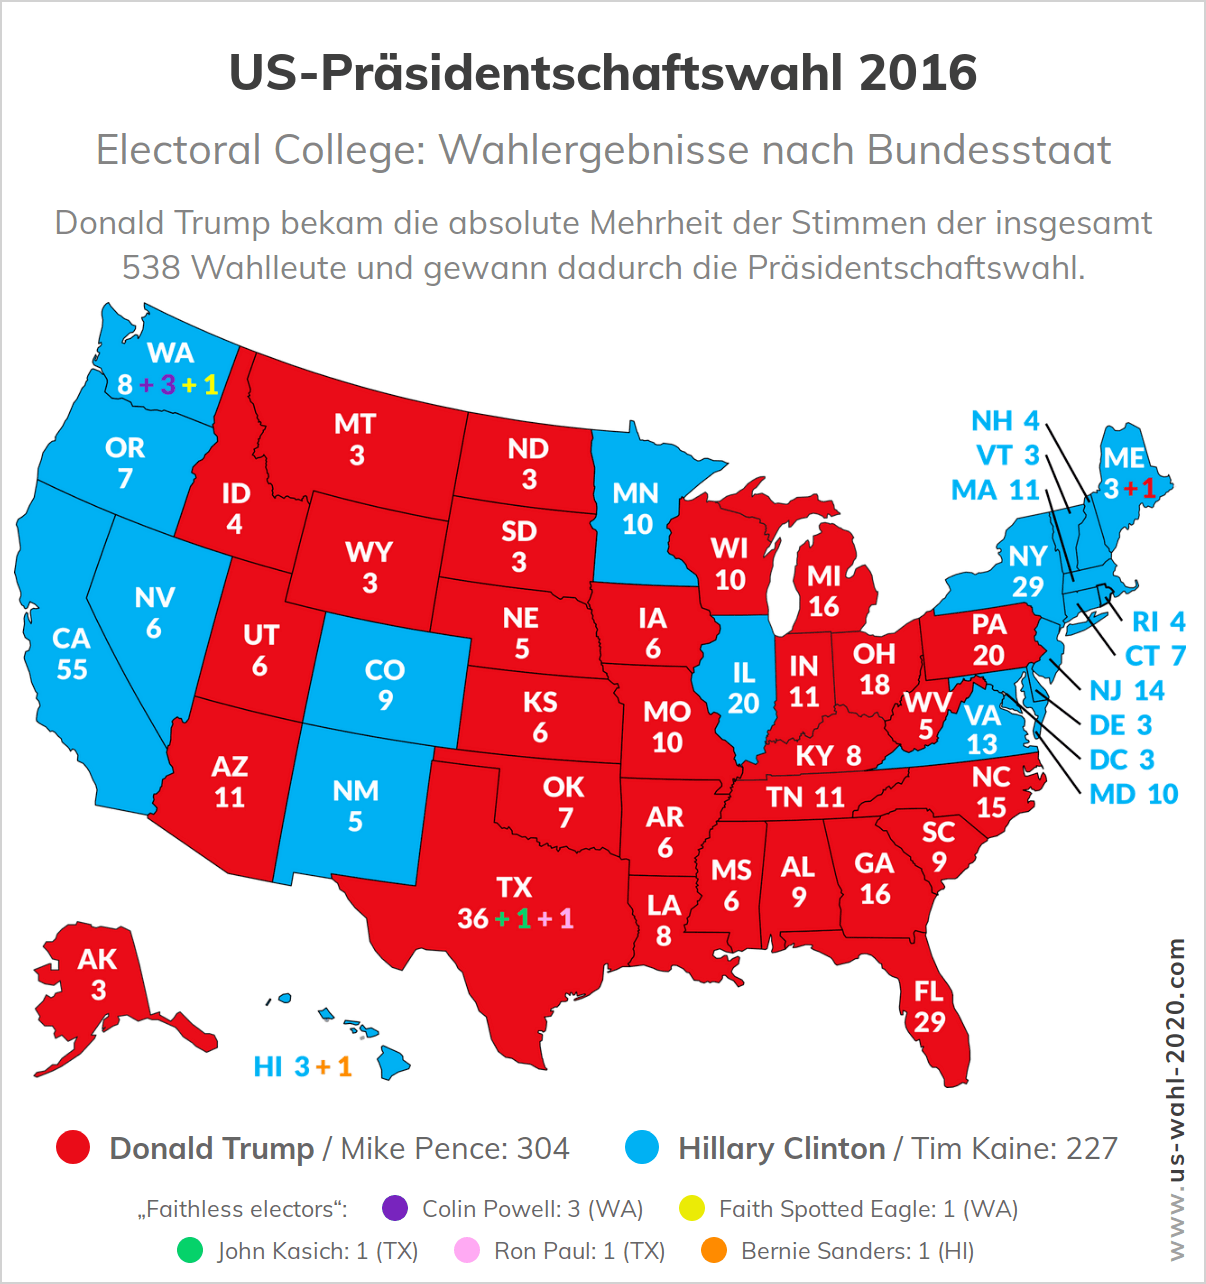 US-Wahl 2020 – Electoral College: Wahlergebnisse nach US-Bundestaat (Ausgangslage)